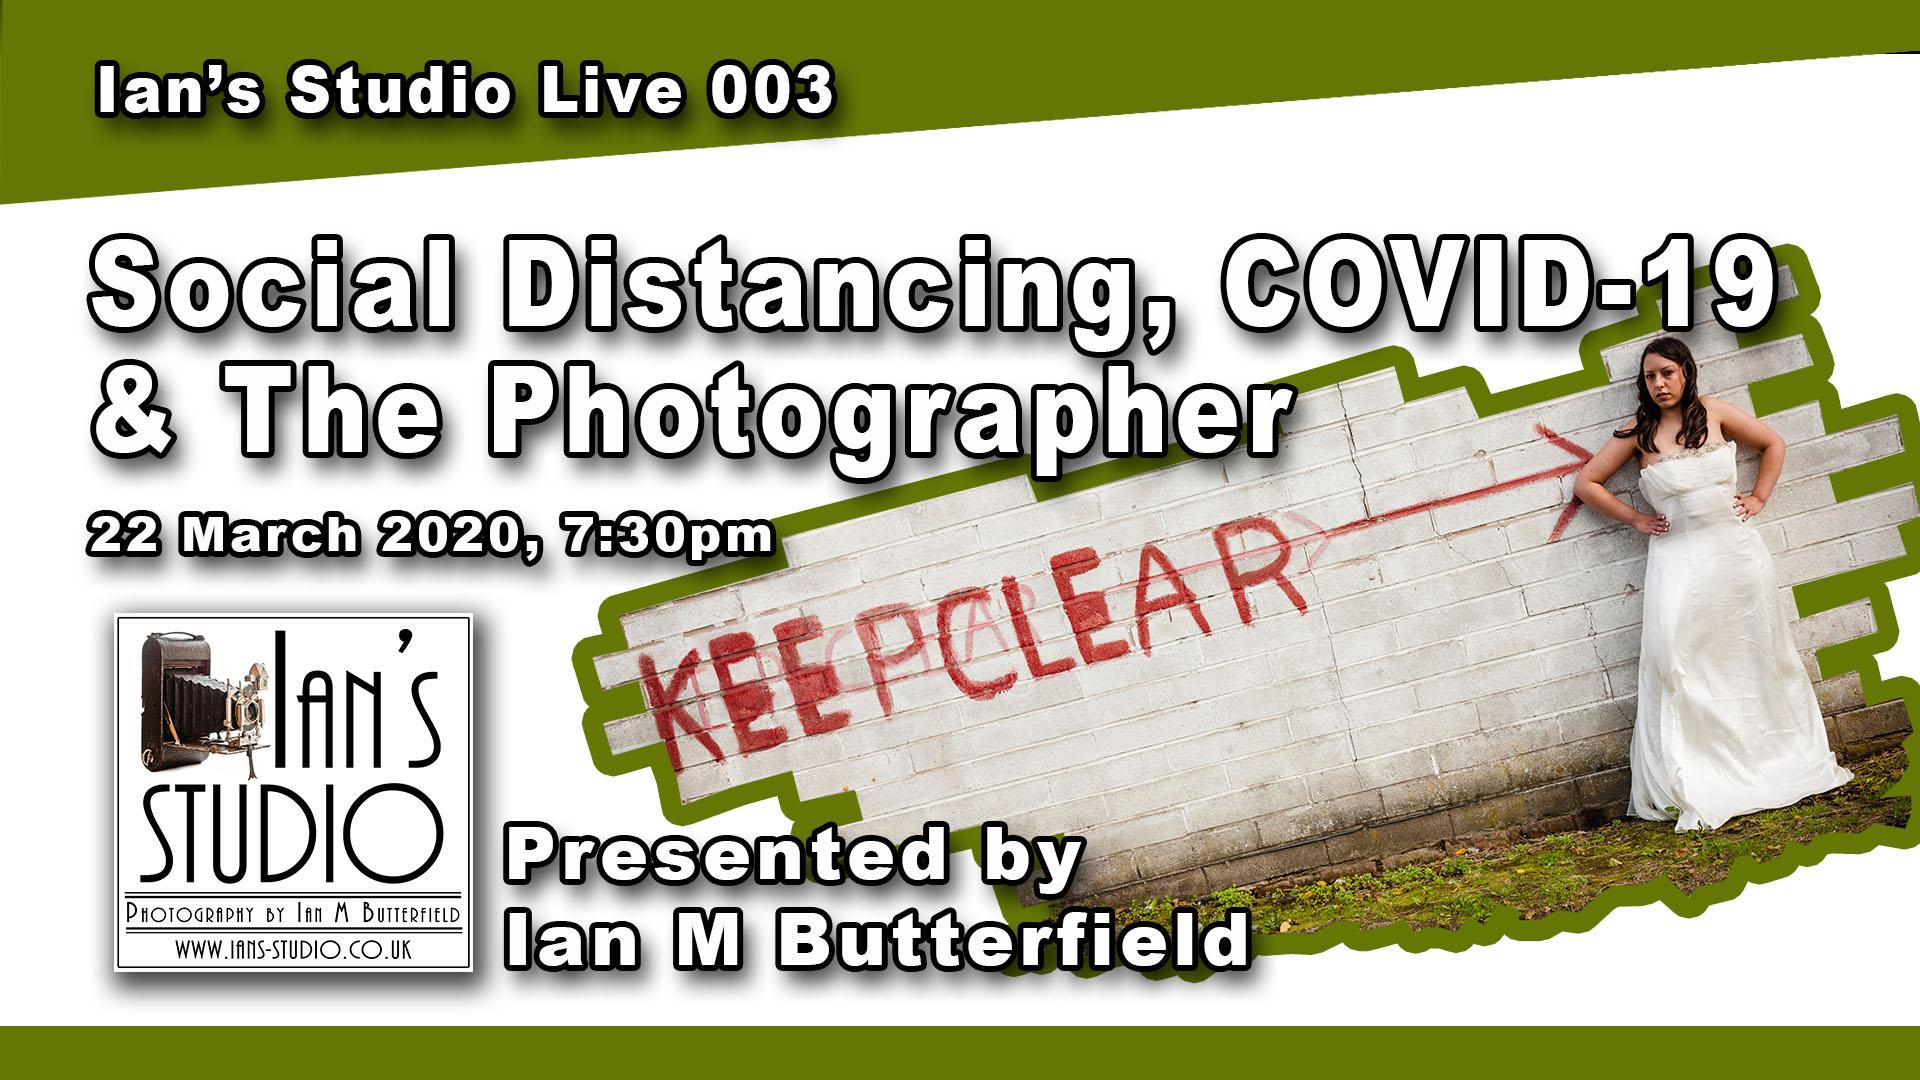 22 MAR 2020 LIVESTREAM FULL REPLAY: Ian's Studio Live #003 – Social Distancing, COVID-19 & The Photographer